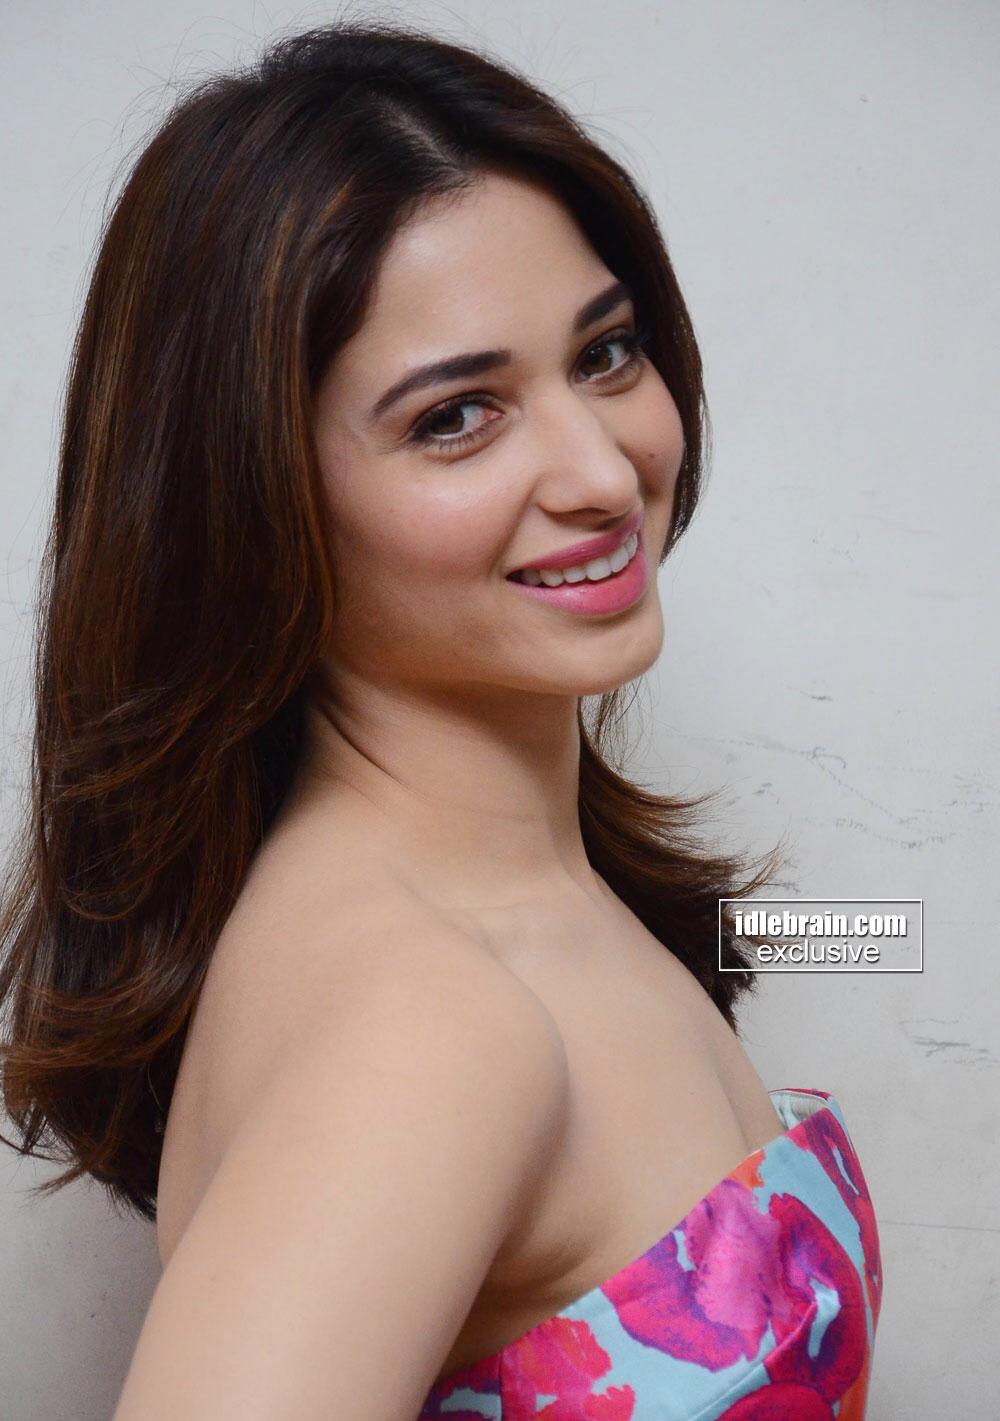 Natasha Malkova Wallpaper Tamil Actress Tamanna South Indian Dani Daniels Trisha